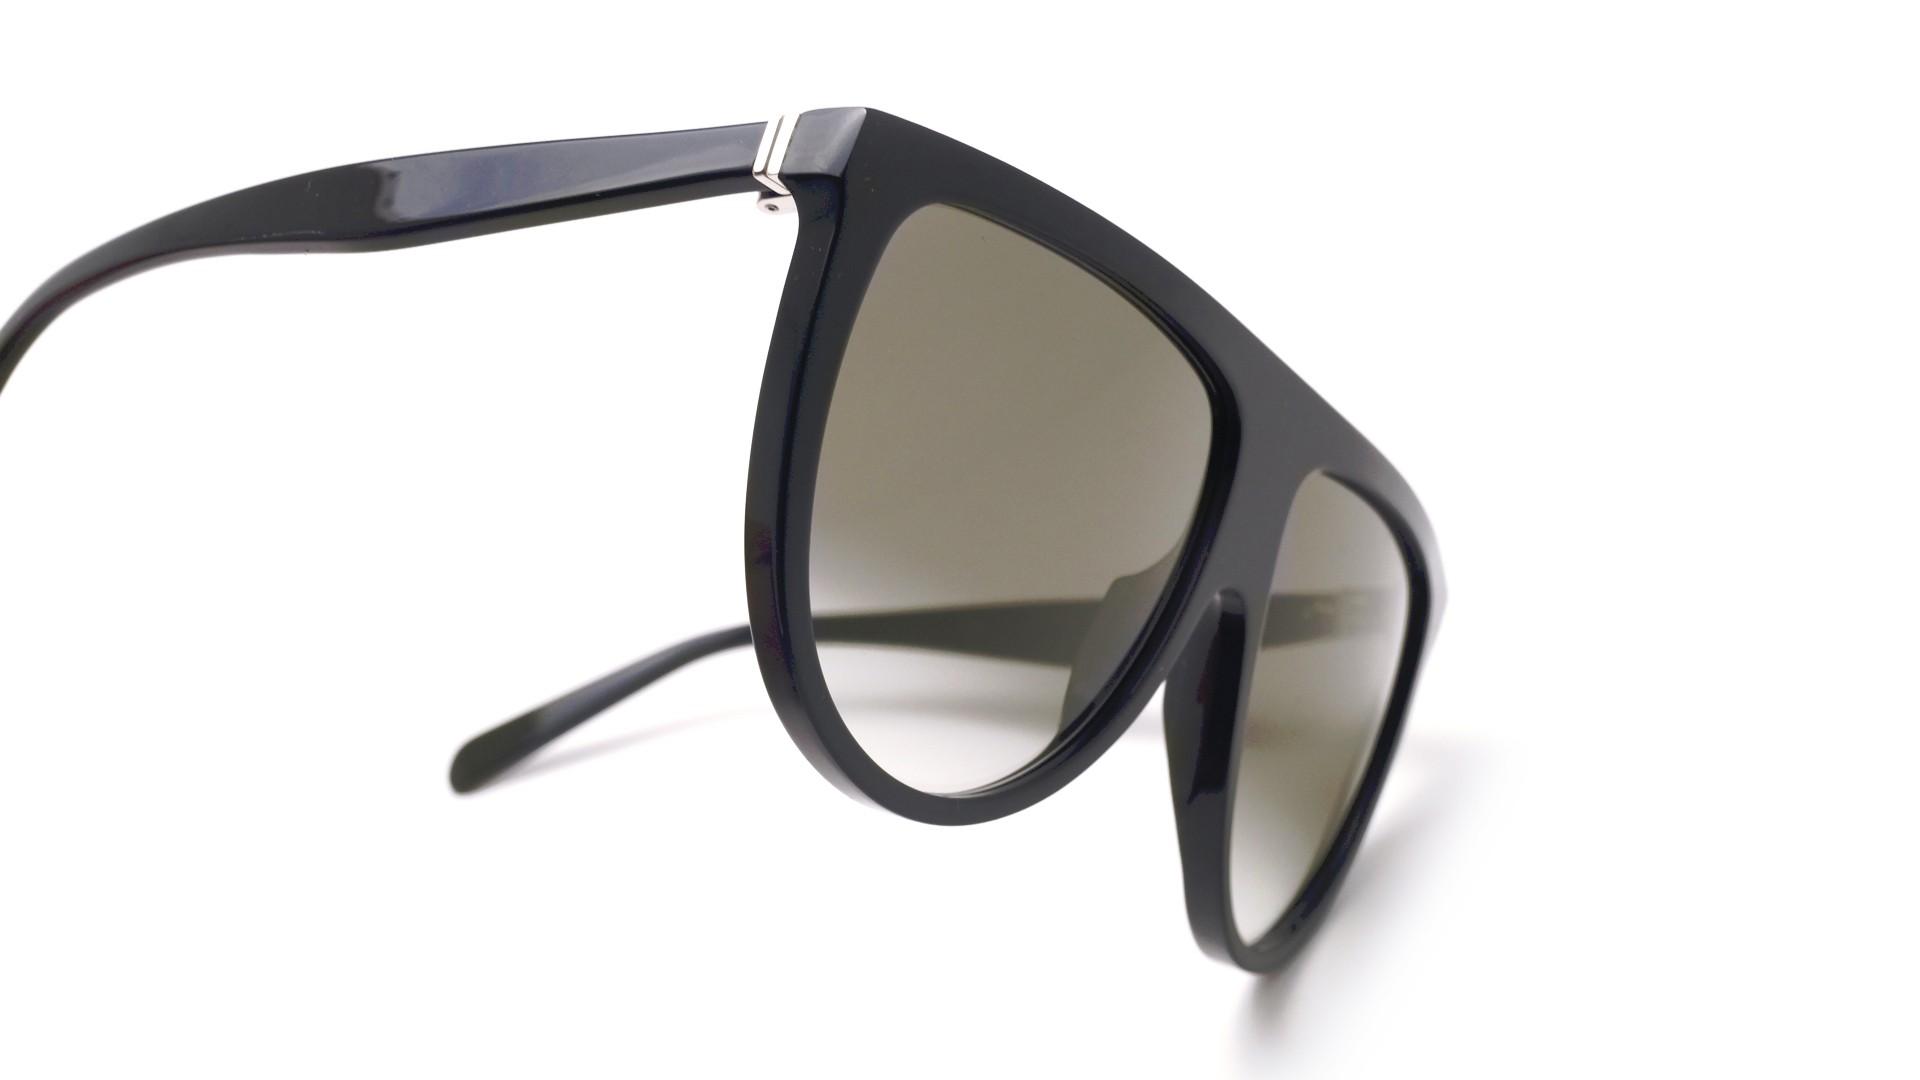 cc87bc829dab Sunglasses Céline Thin shadow Black CL41435S 807XM 61-14 Large Gradient